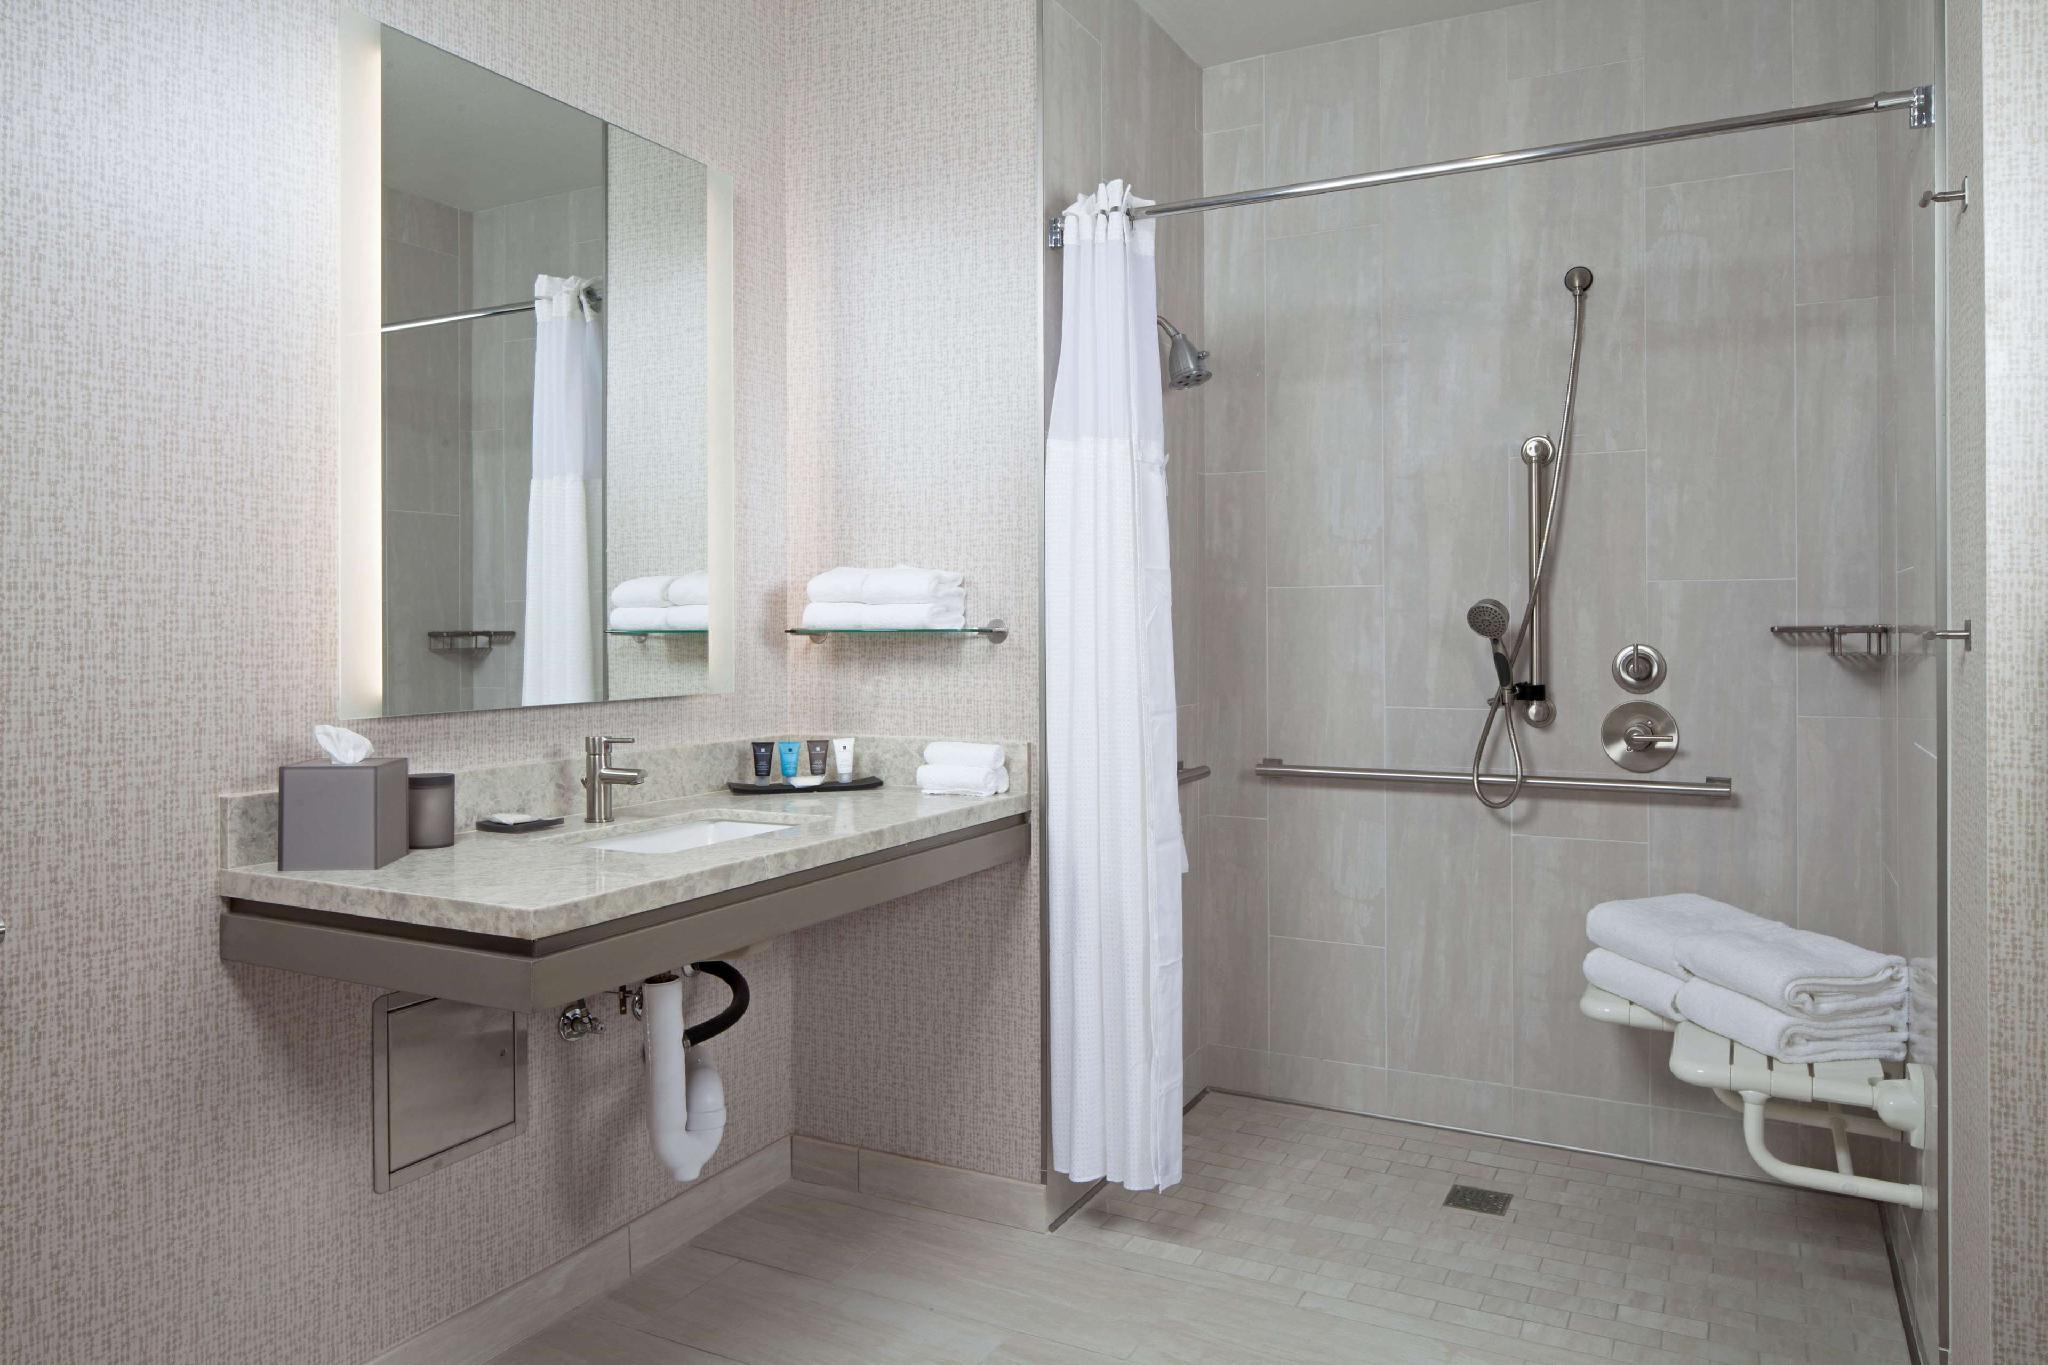 Deluxe 2 Queen Accessible Roll in Shower